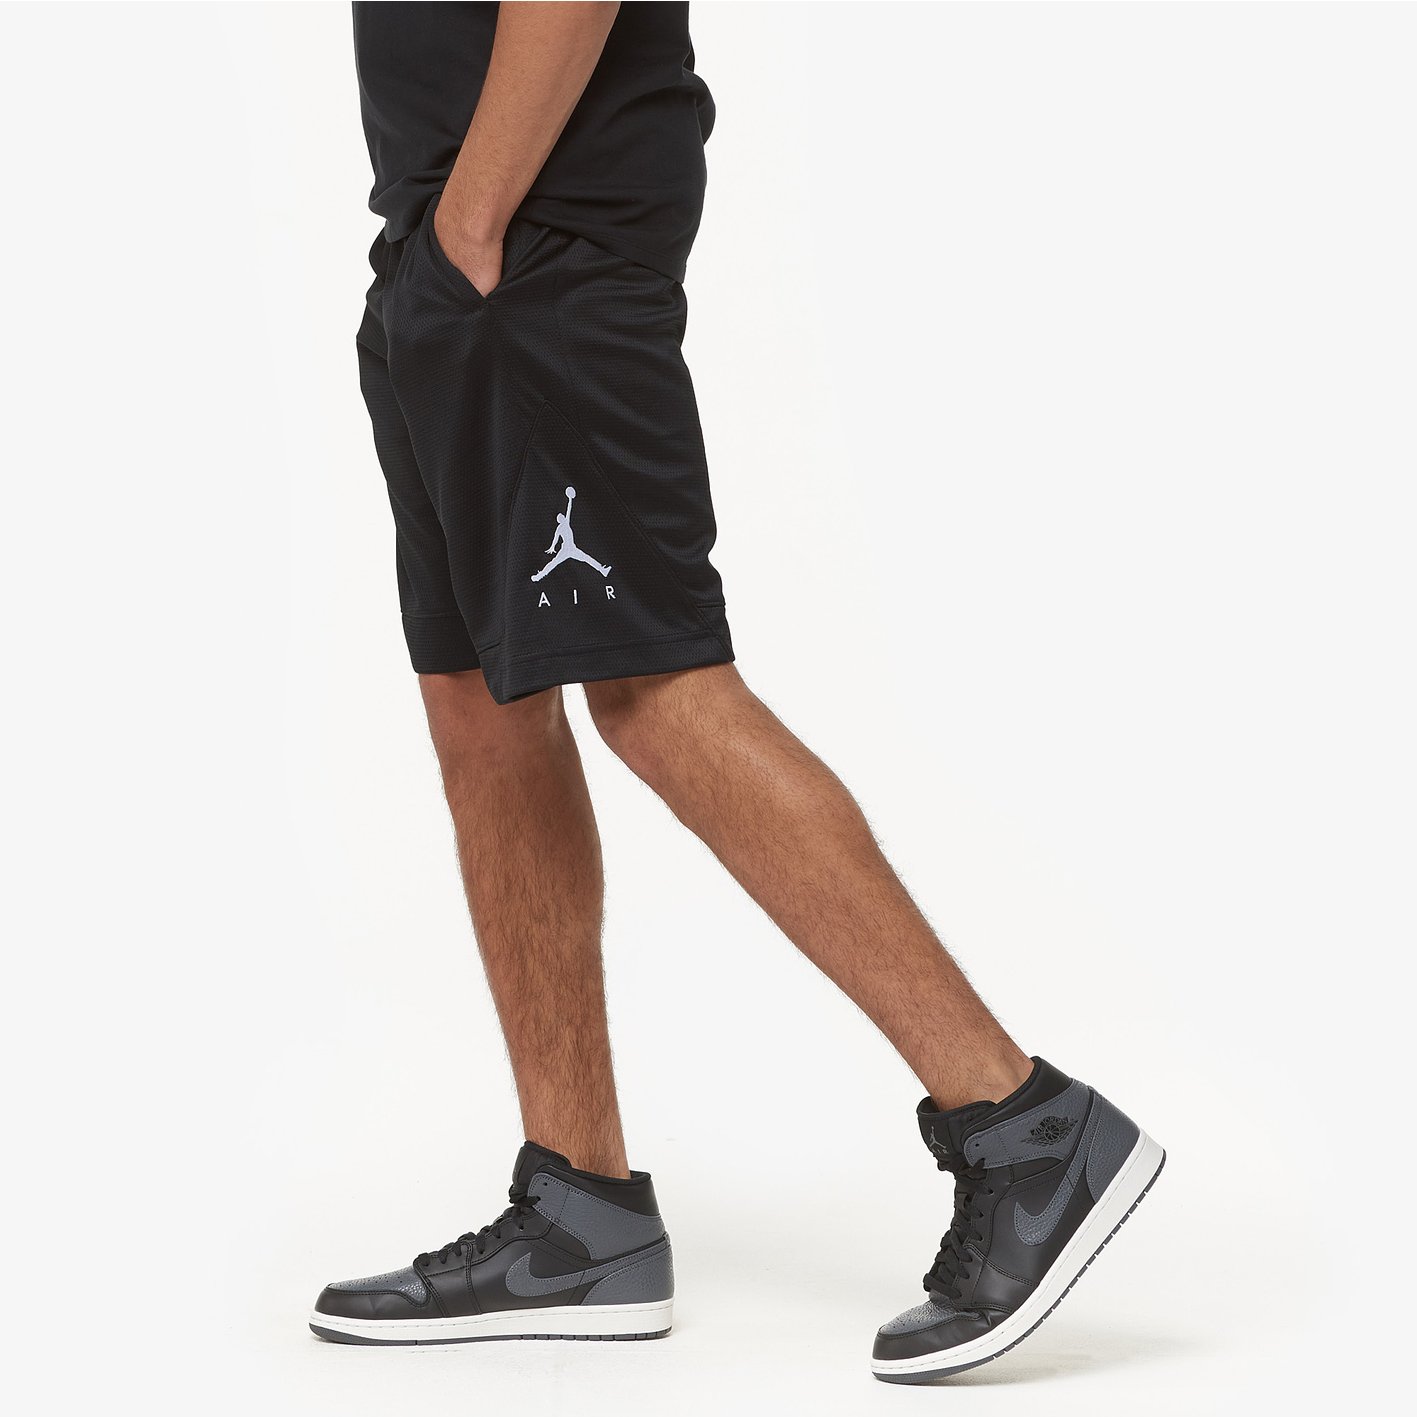 7acfb9719f4 Jordan Rise Striped Triangle Shorts - Men's - Basketball - Clothing ...